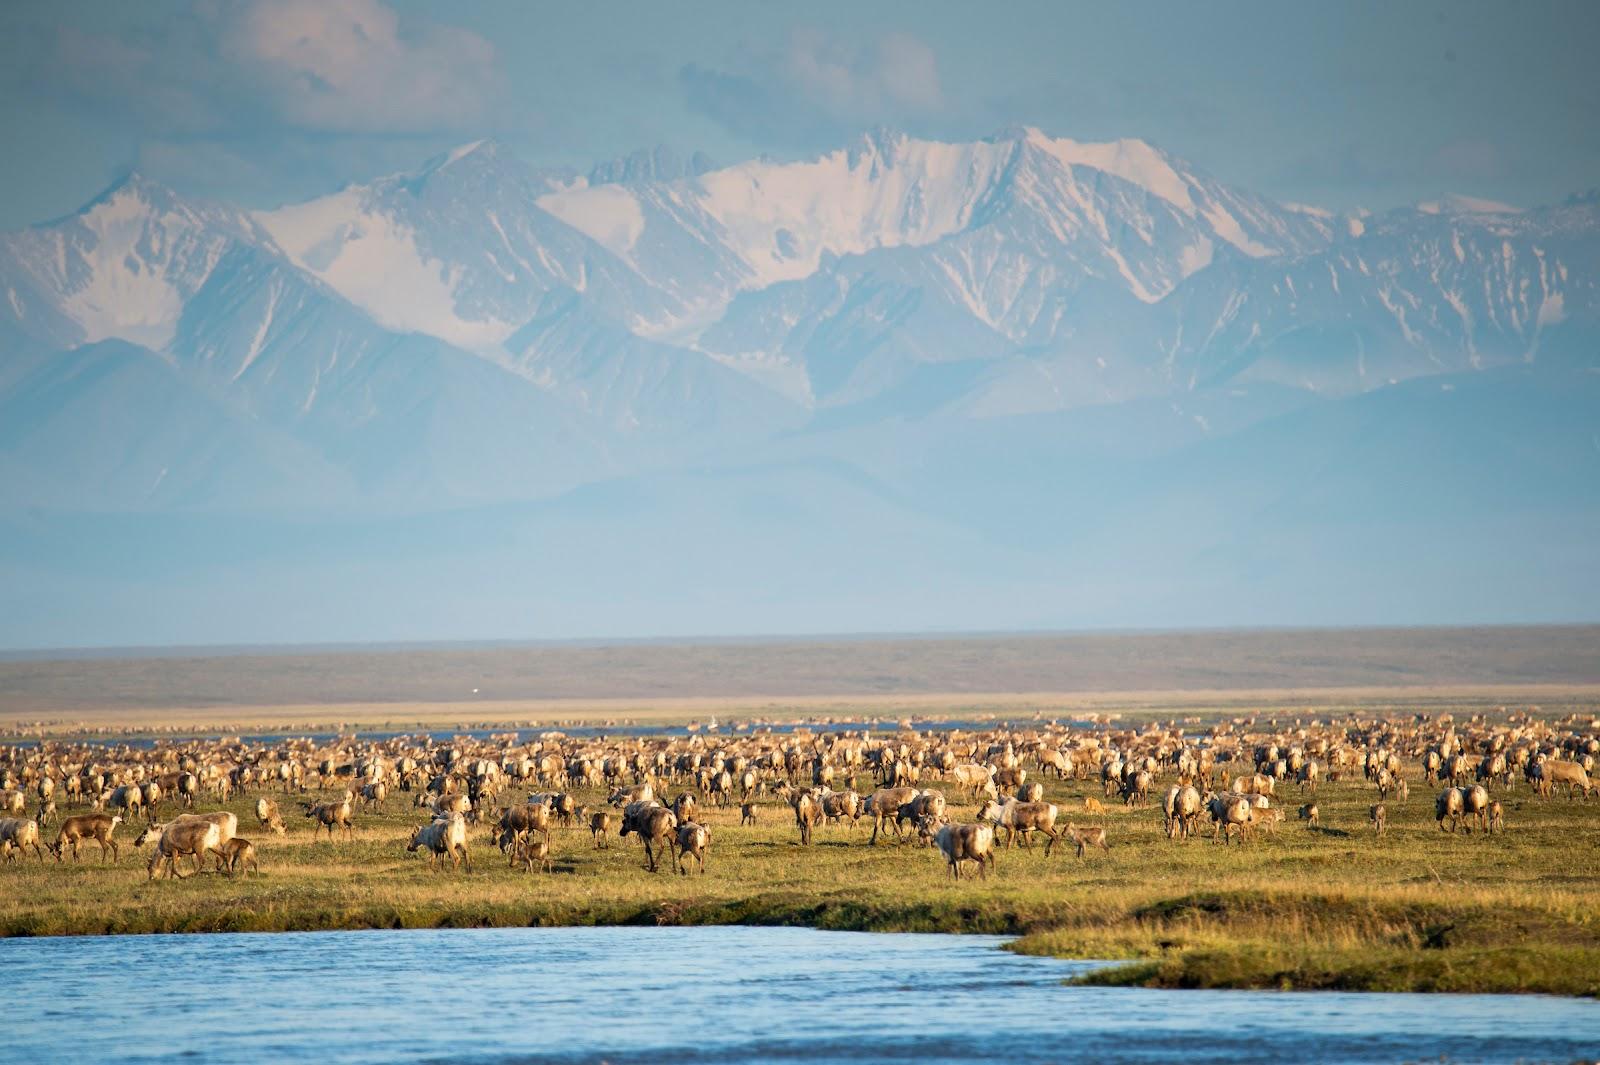 Porcupine caribou herd on the coastal plain of the Arctic National Wildlife Refuge